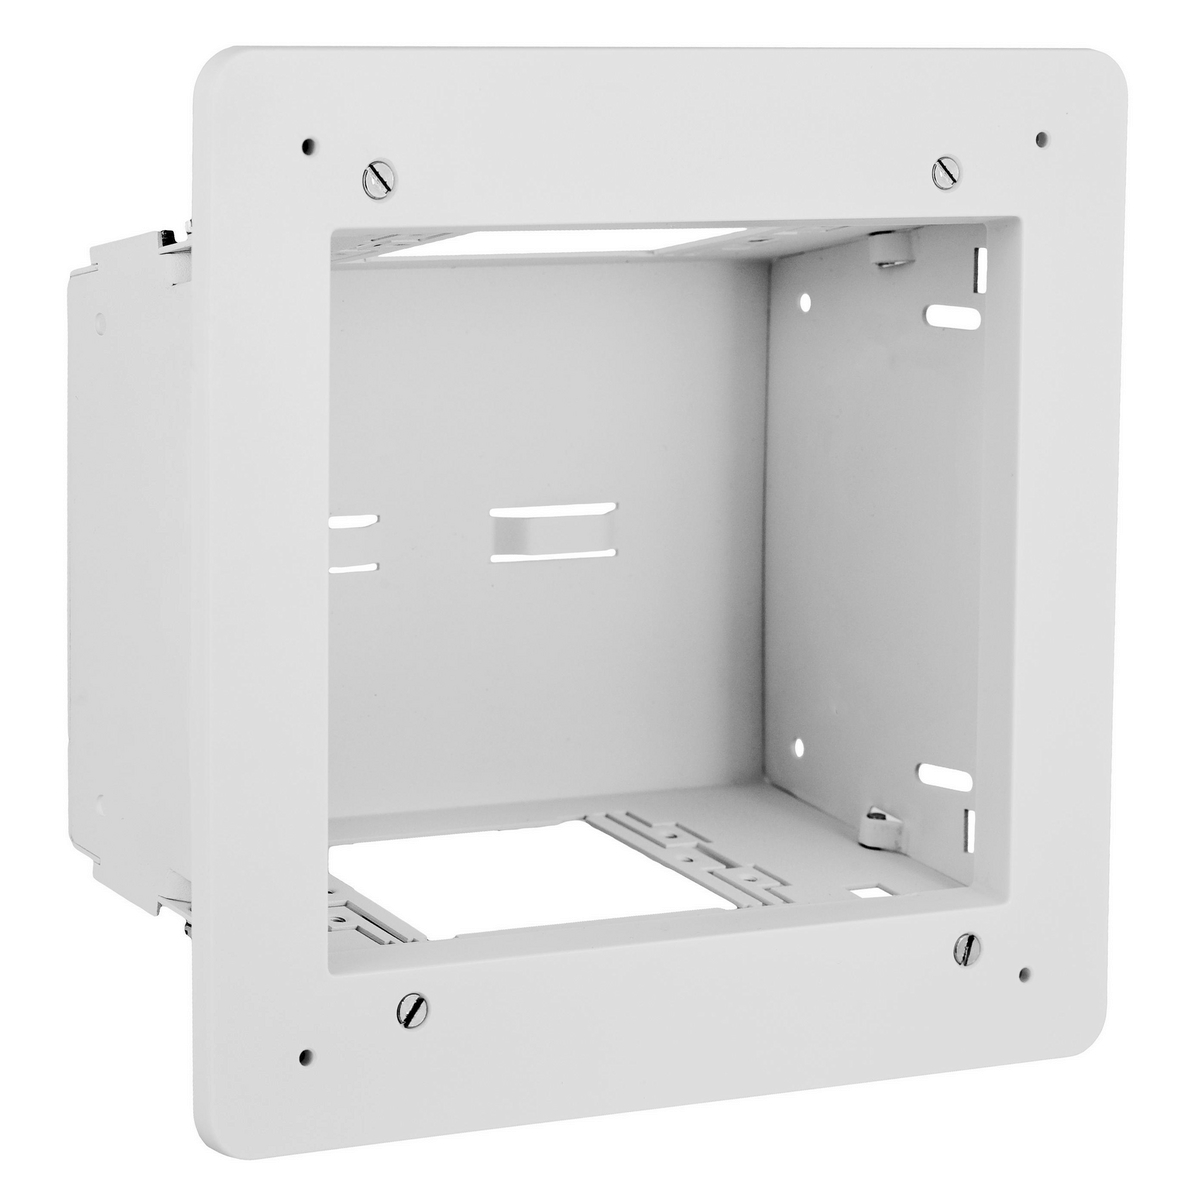 Nsav62m Brand Wiring Device Kellems Hdmi Wall Plate Wbp Prodimage Nsav62m2 Loaded Angle Nsav6c App Assembled